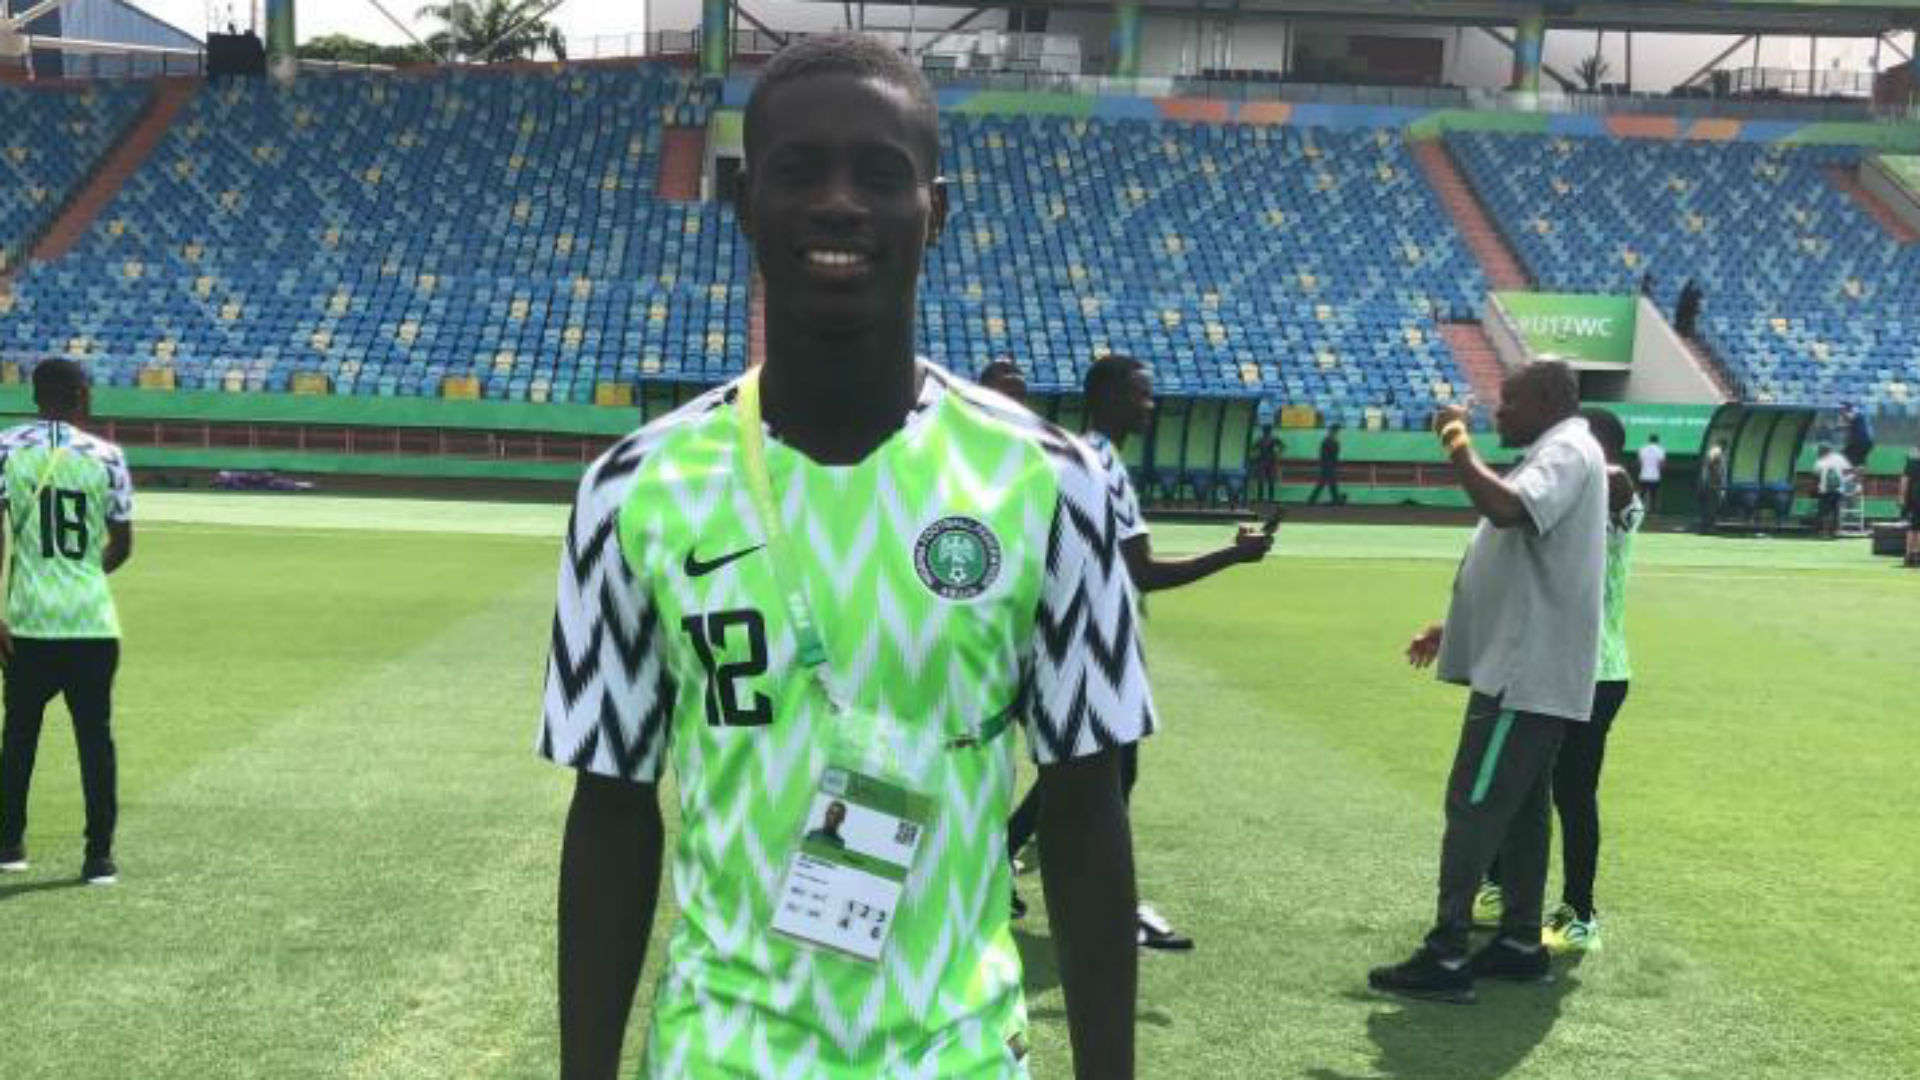 U17 World Cup: 'Little Ronaldo' Olawale leads Nigeria attack vs Australia